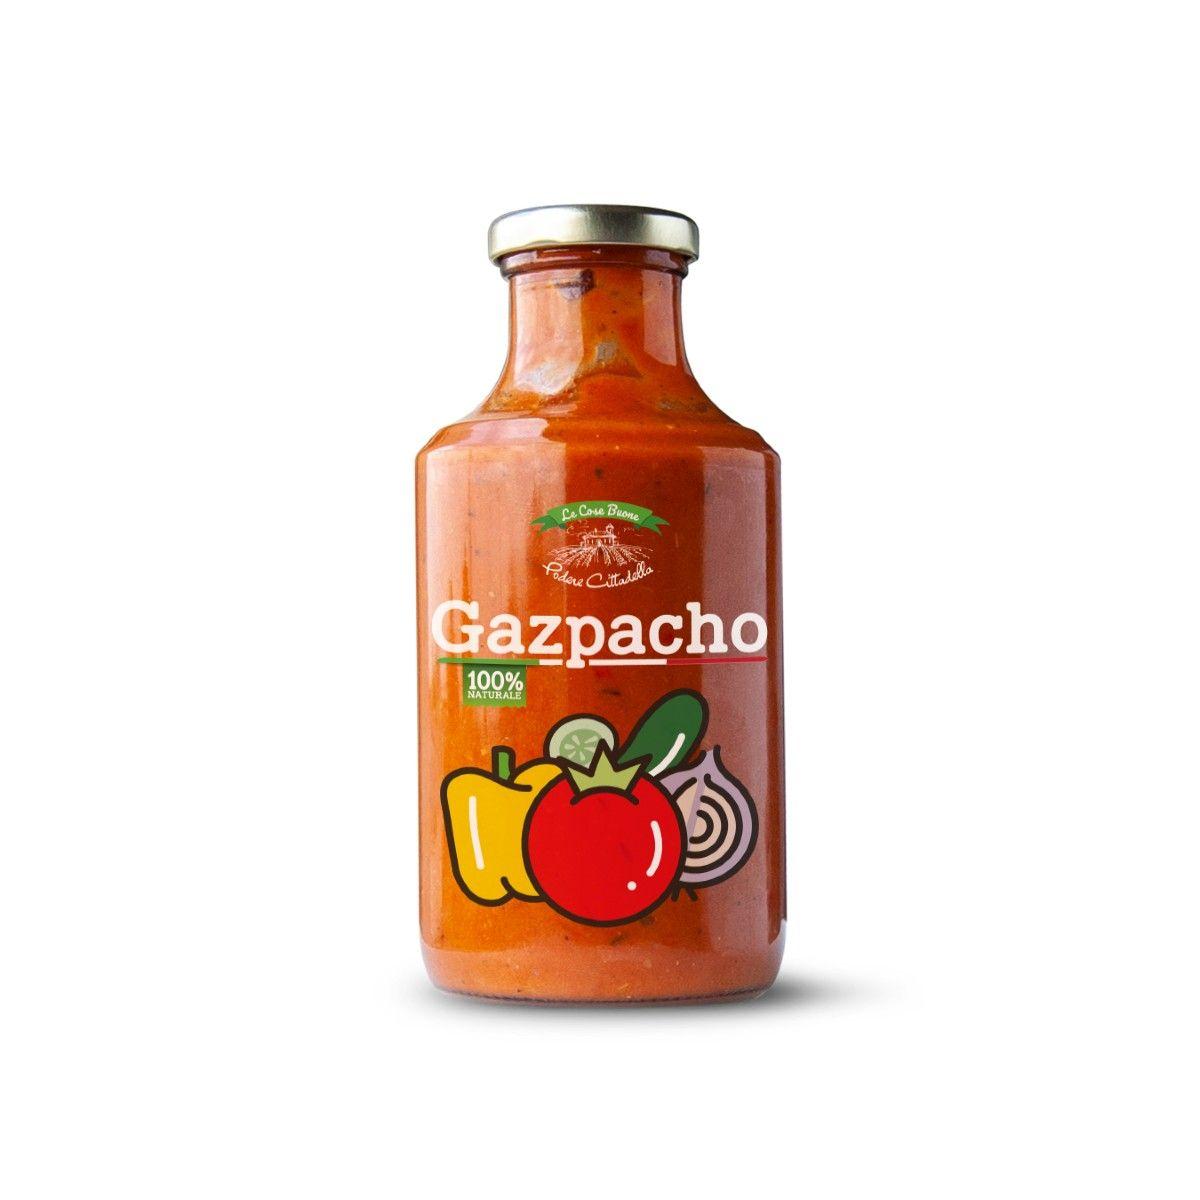 Gazpacho - 500g